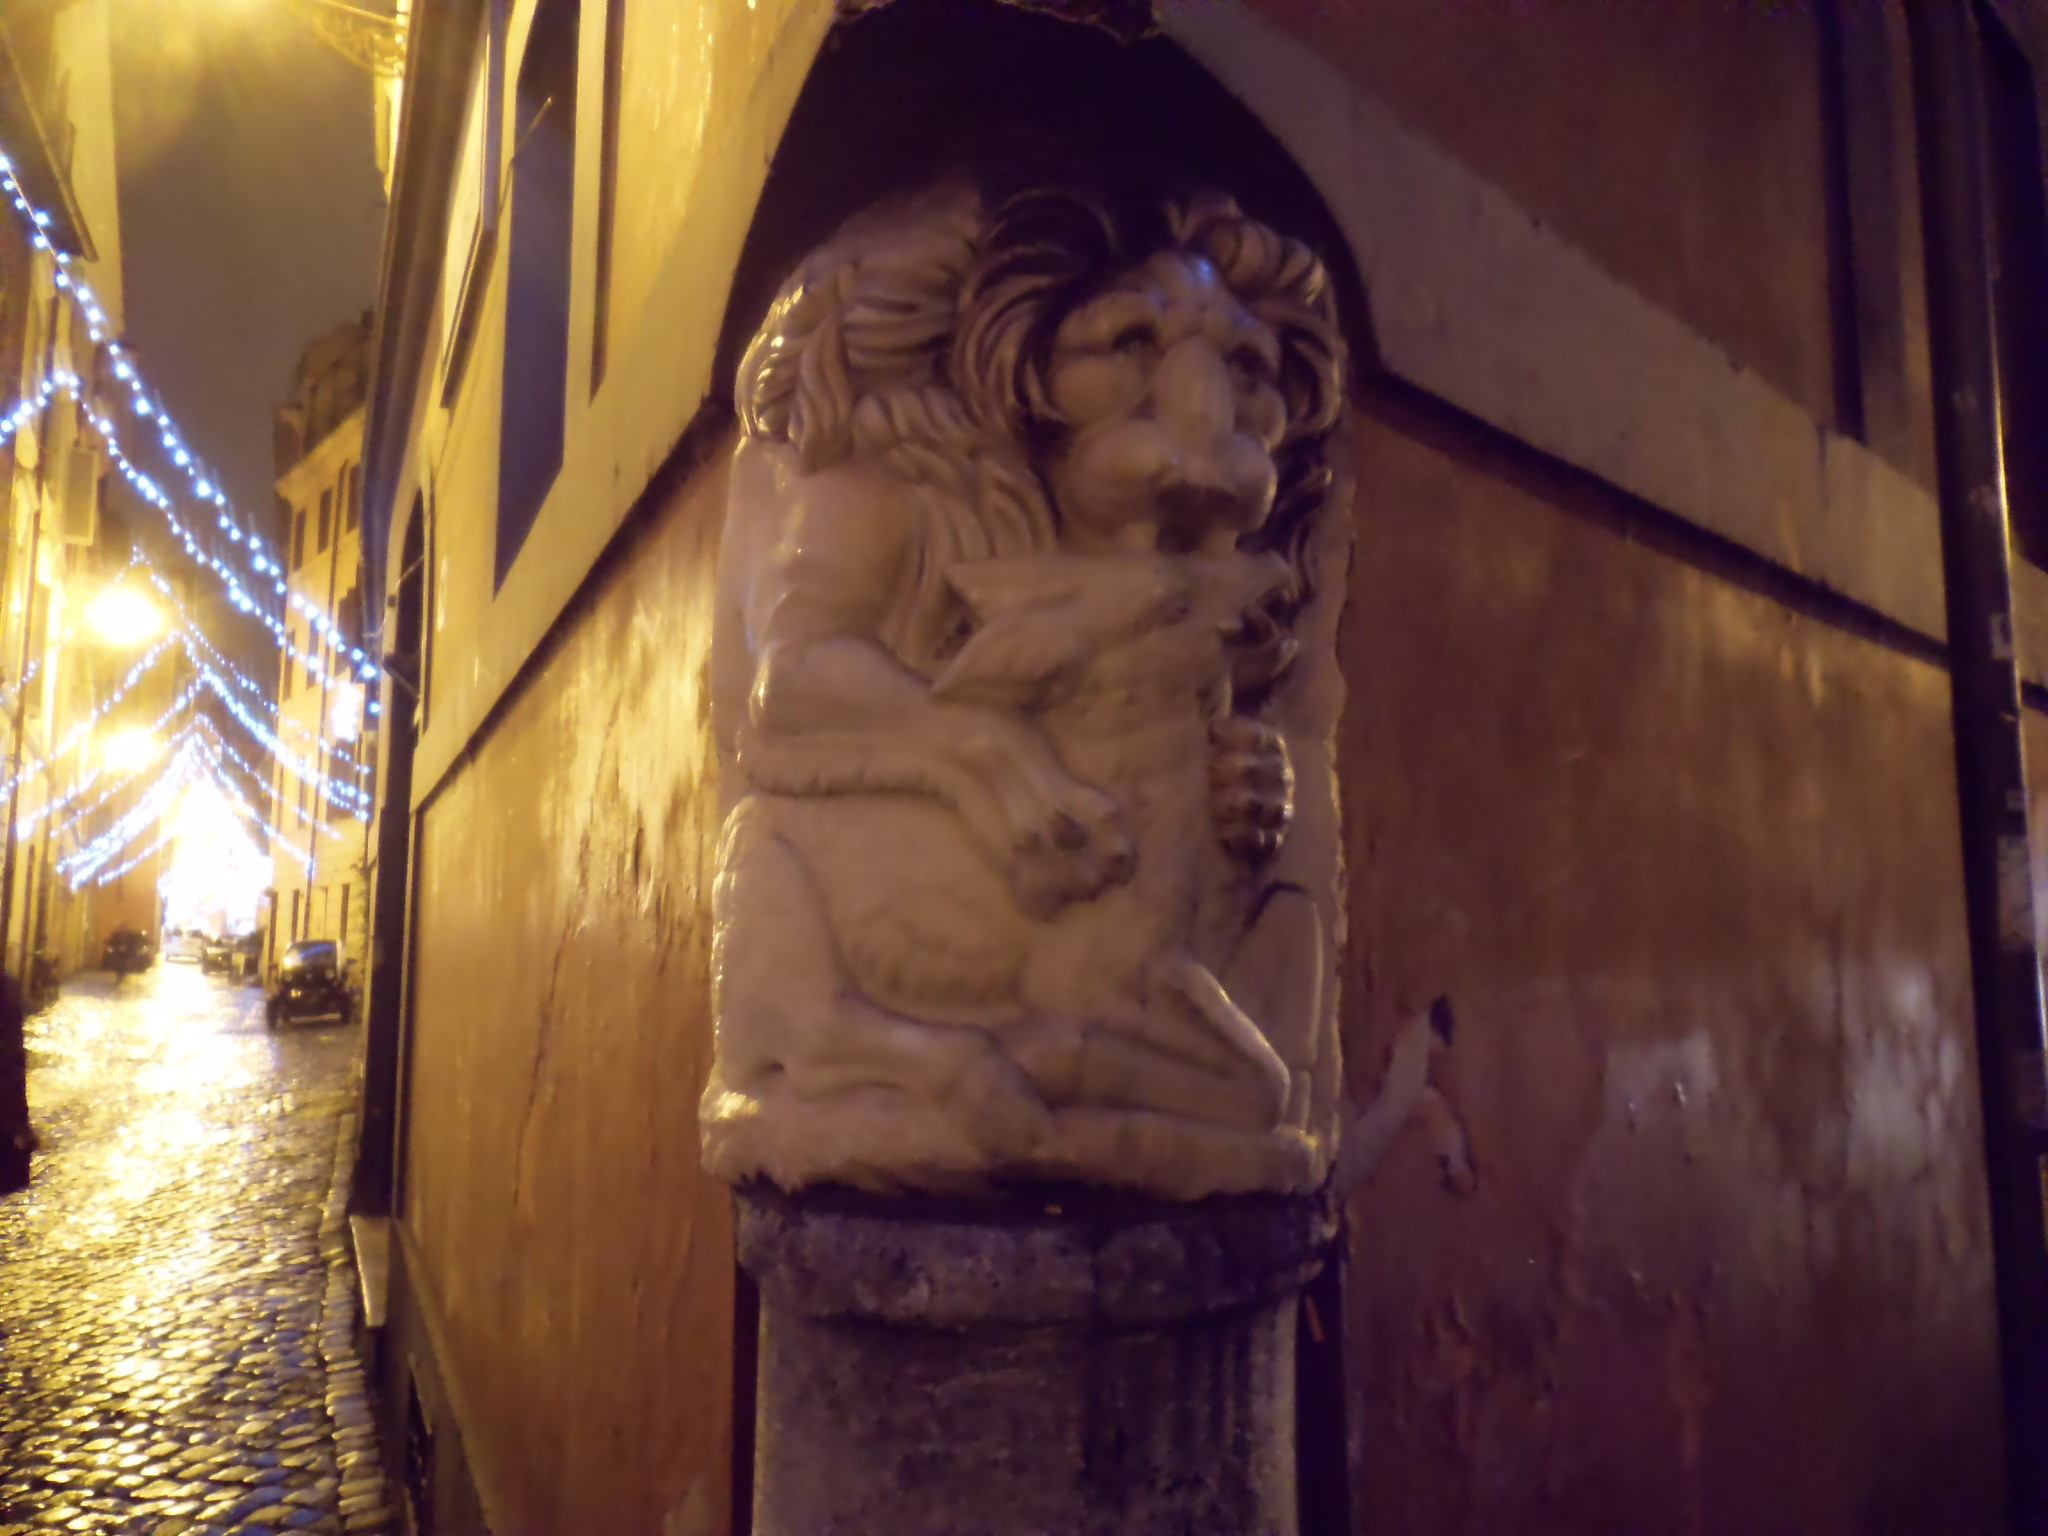 prostitutas de lujo prostitutas a domicilio en leon